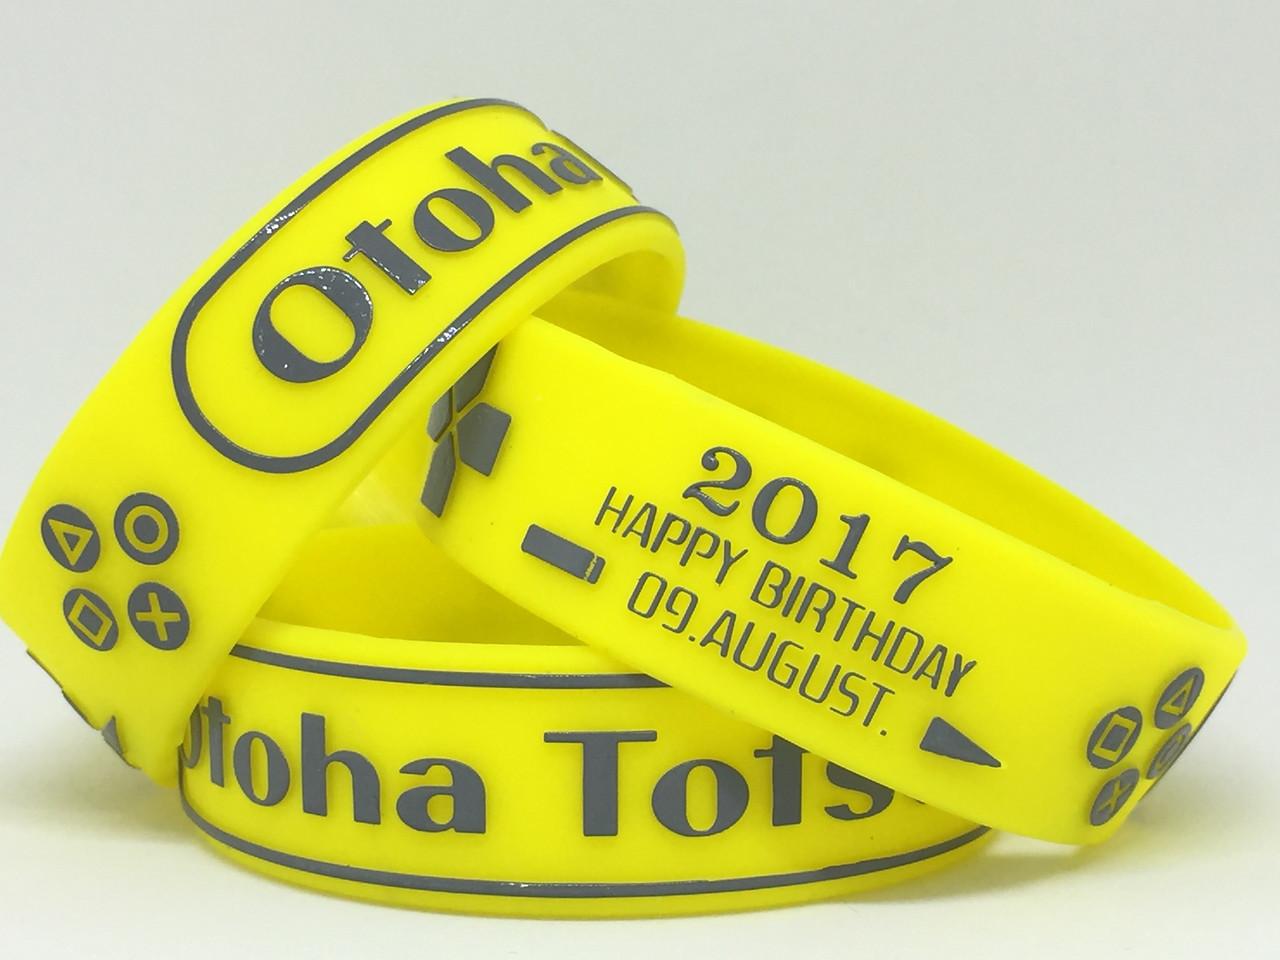 Otoha Totsukaはす 2017 HAPPY BIRTHDAY 09.AUGUST. エンボス加工リストバンド